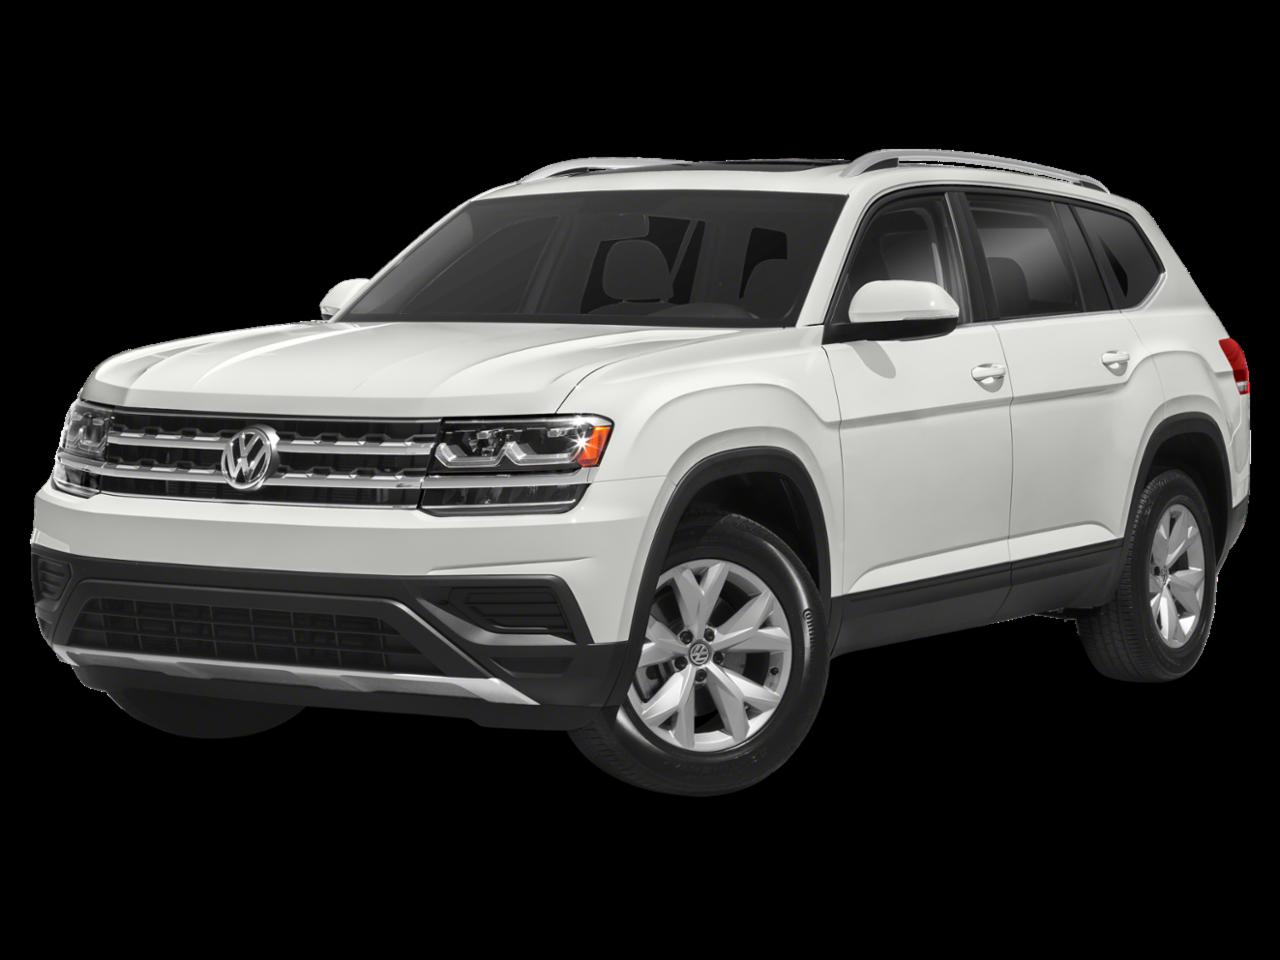 "New 2019 Volkswagen<br /><span class=""vdp-trim"">Atlas 3.6L V6 SEL Premium AWD Sport Utility</span>"